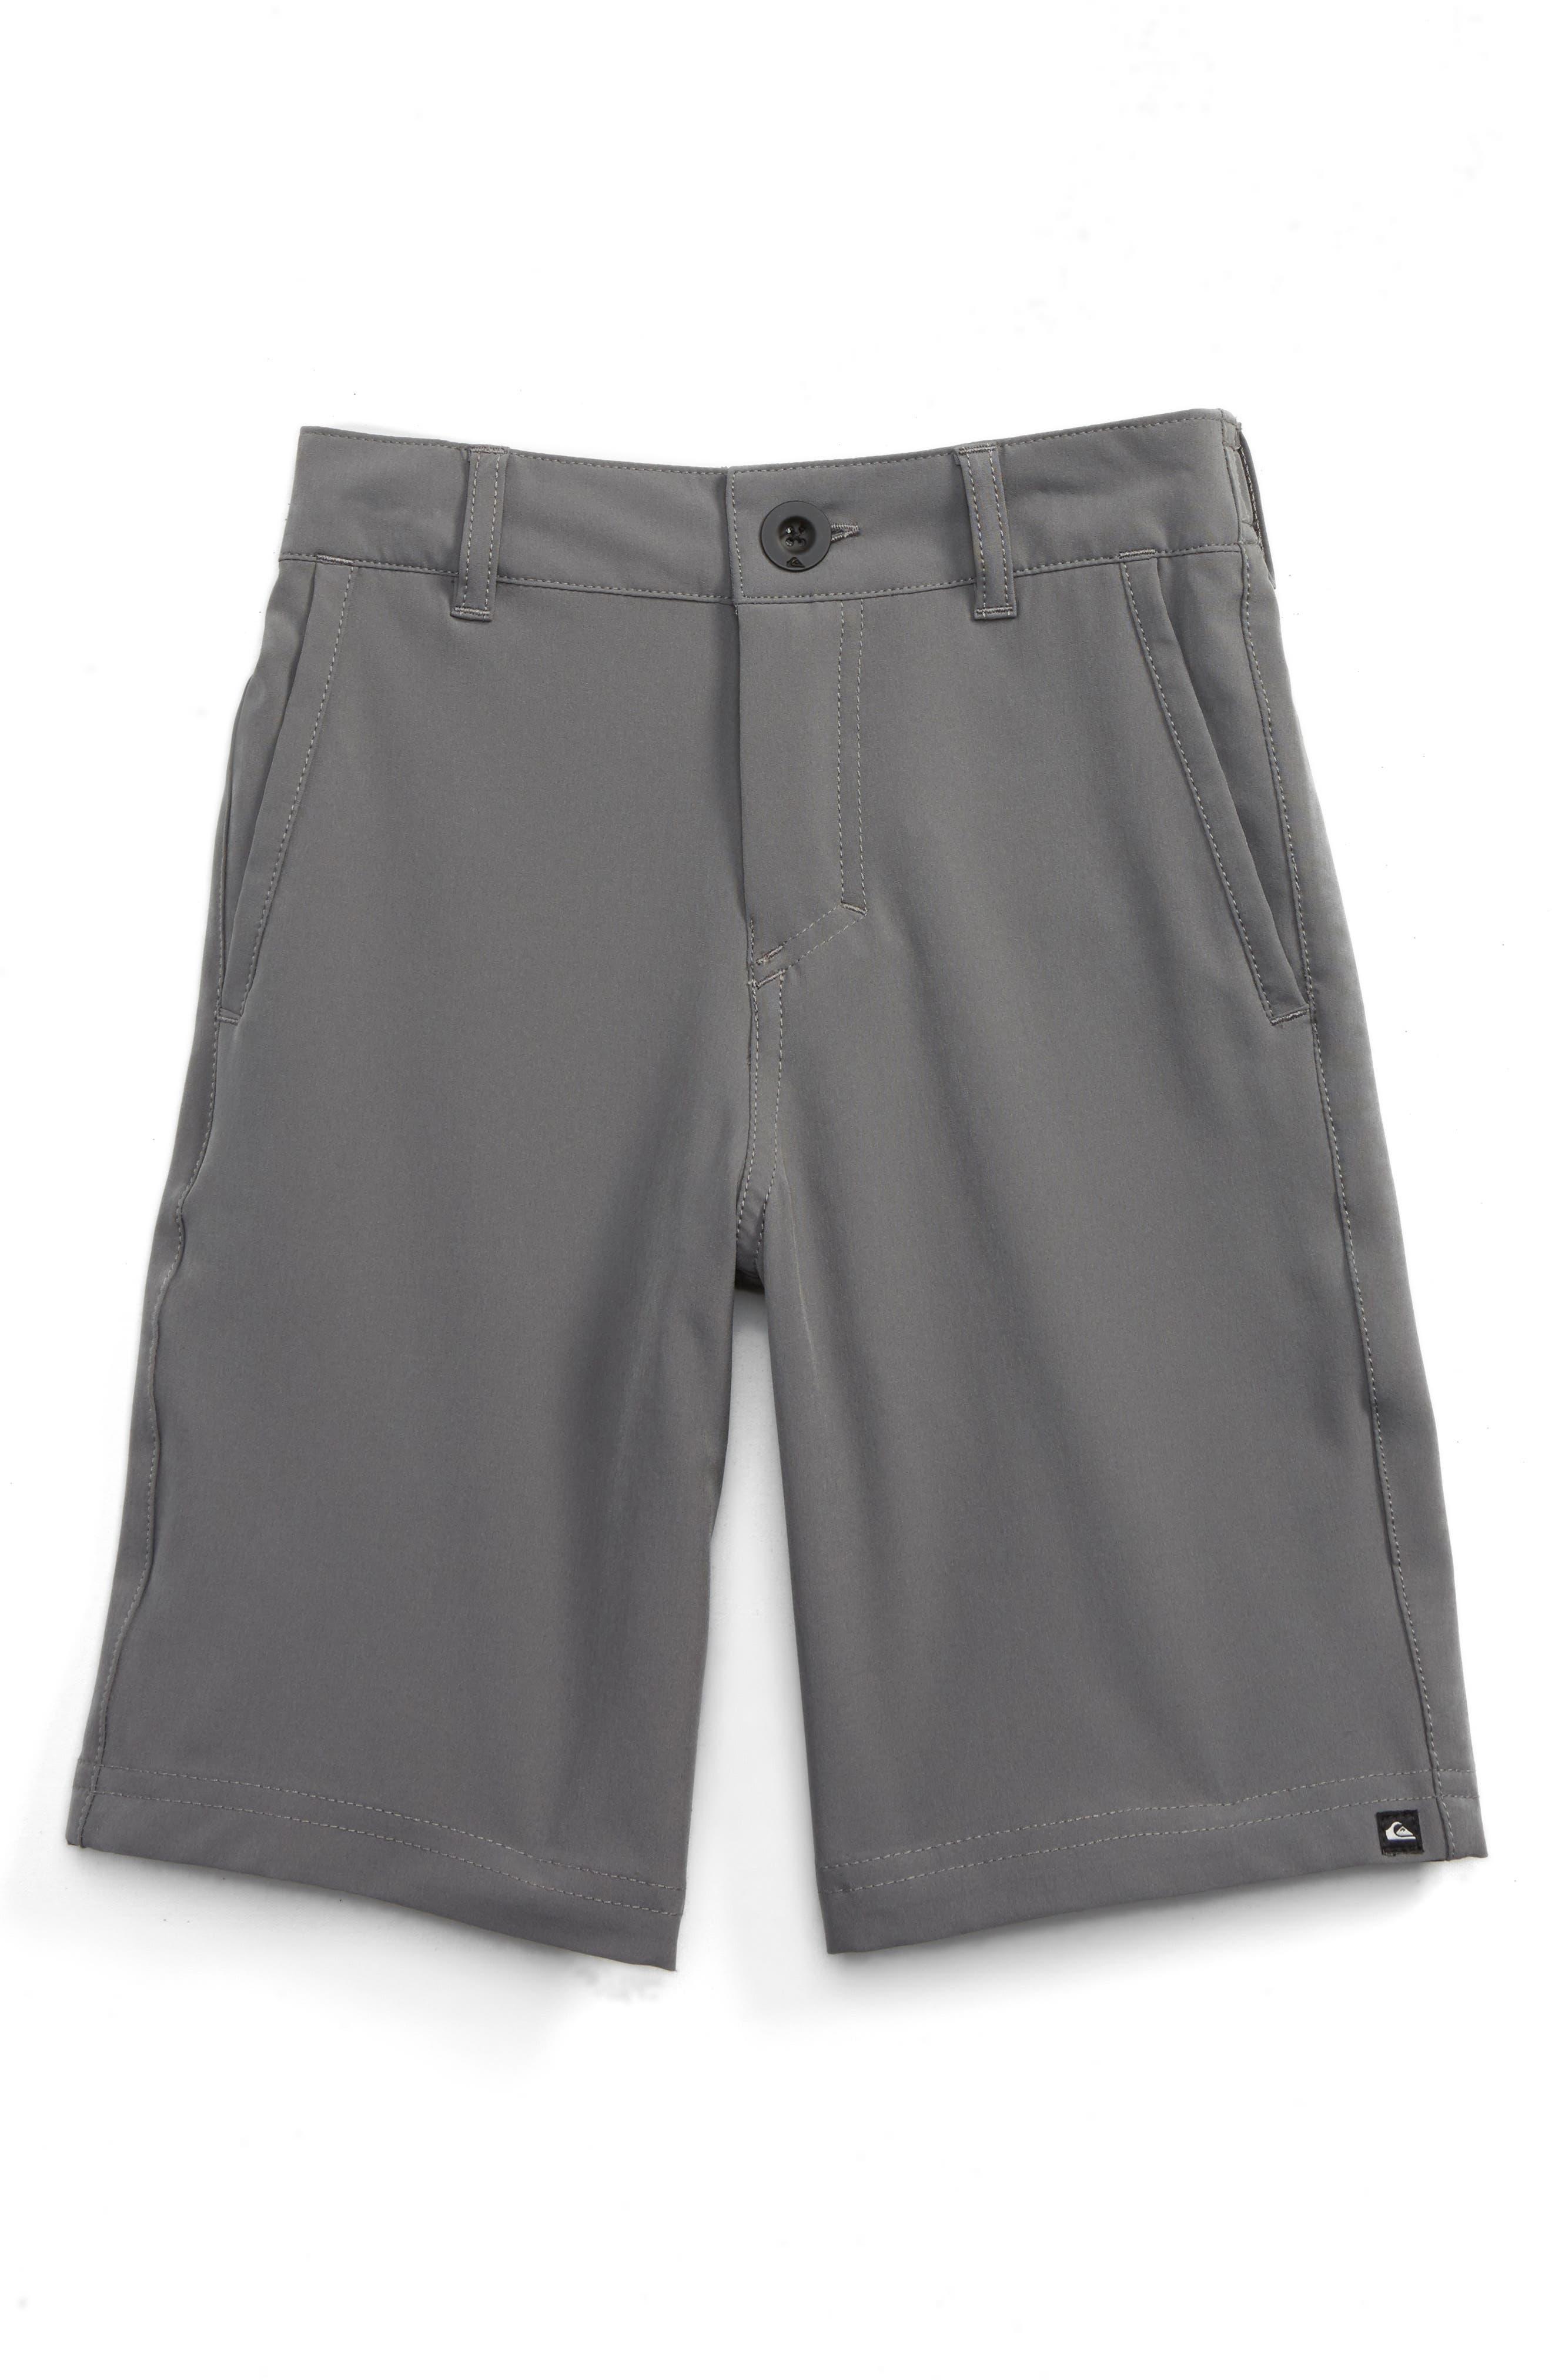 Quiksilver Amphibian Hybrid Shorts (Toddler Boys & Little Boys)